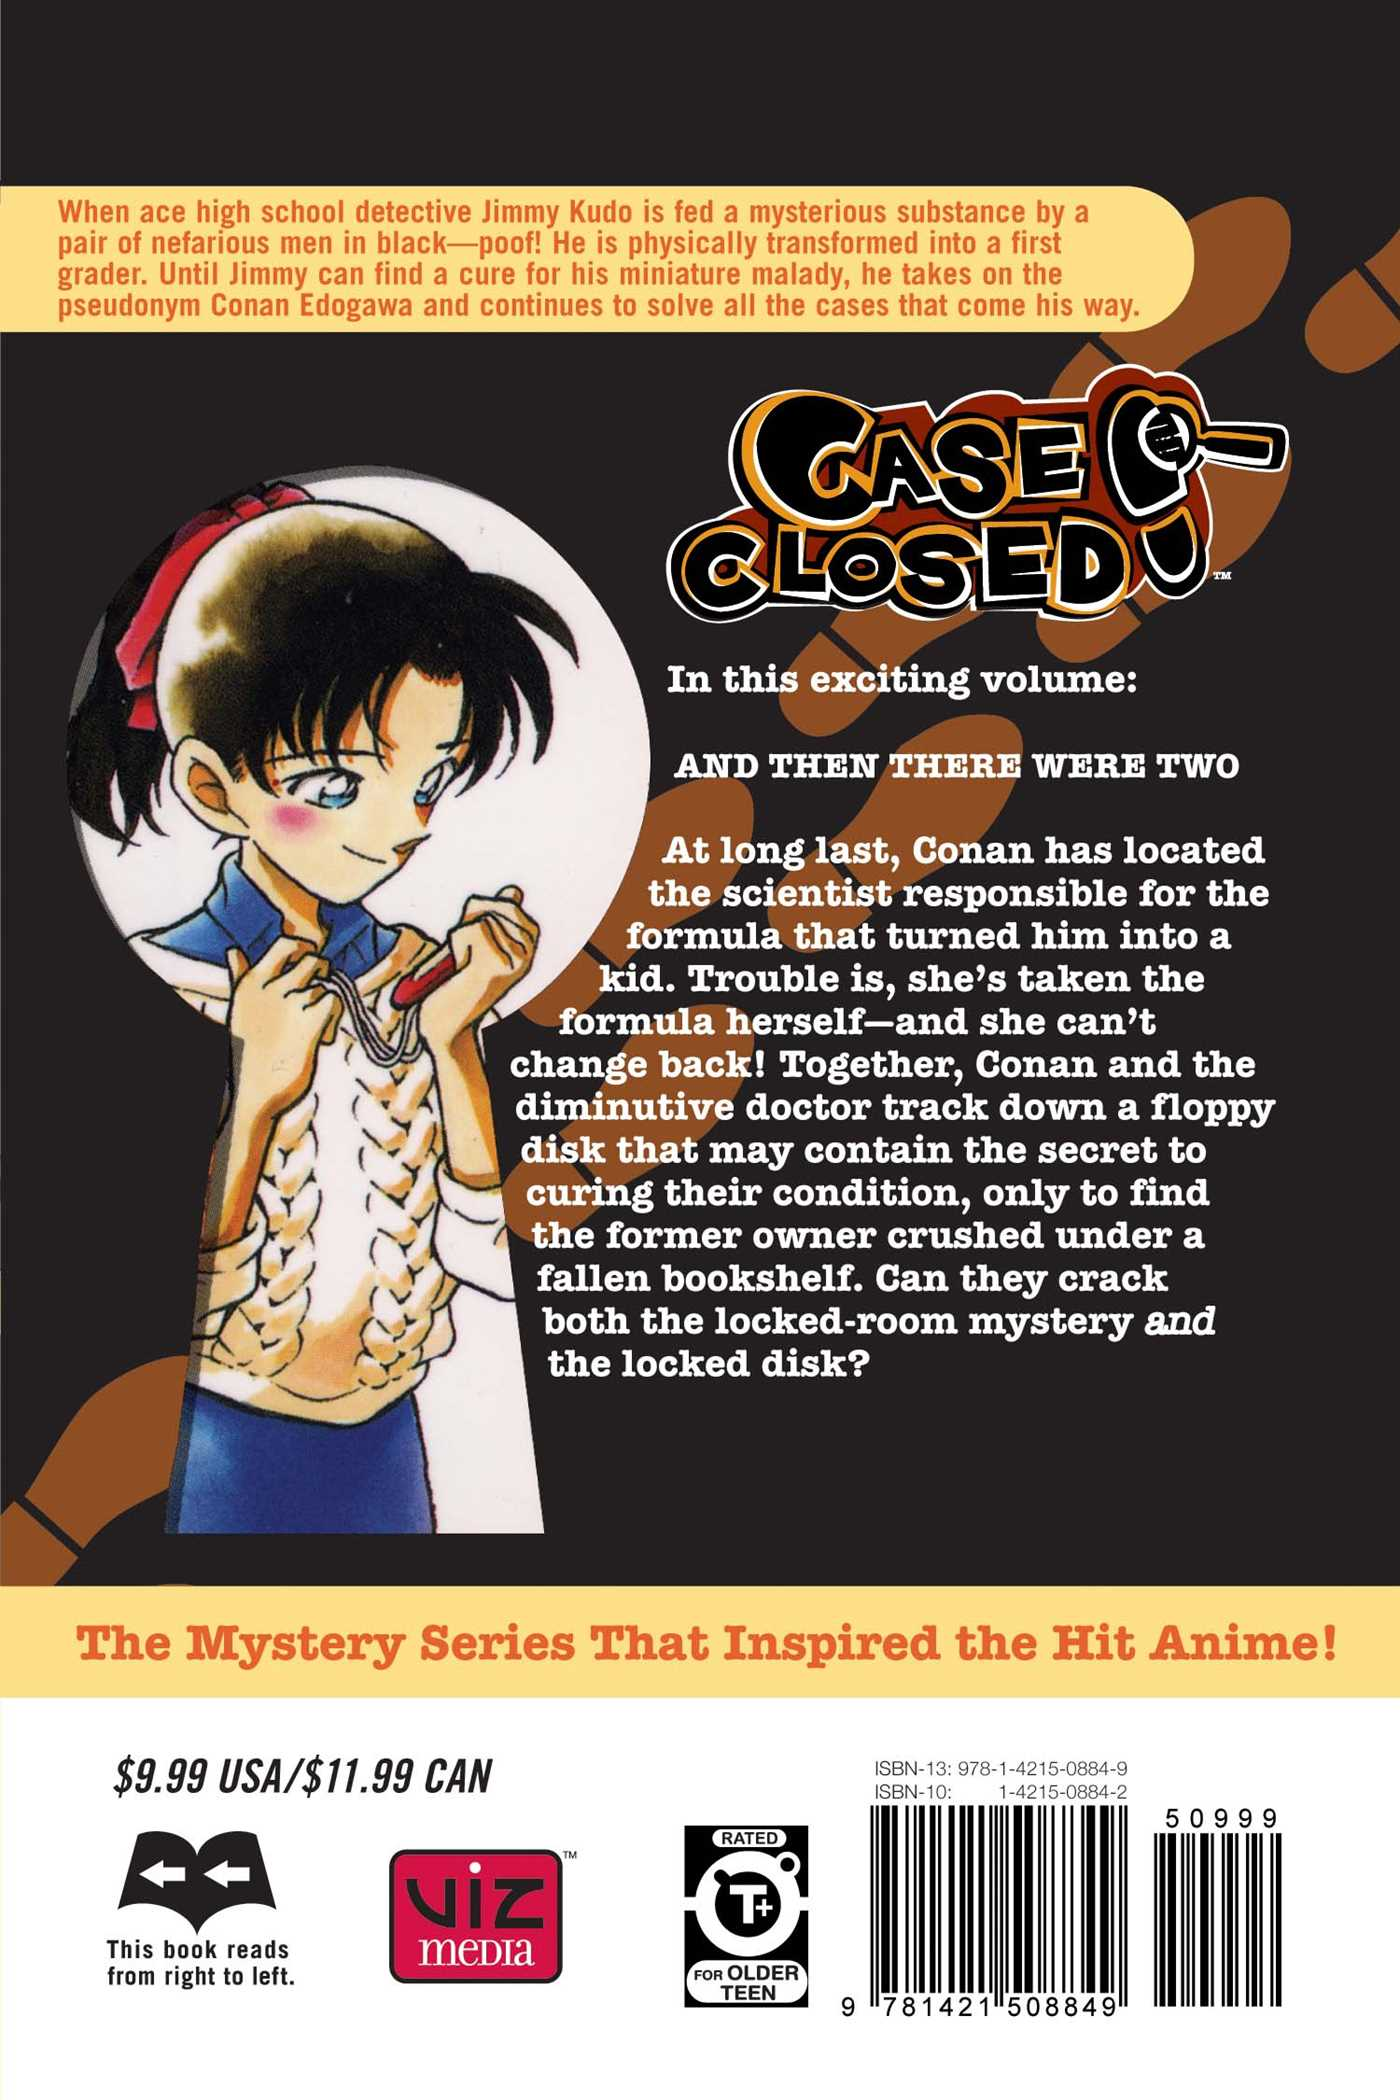 Case closed vol 19 9781421508849 hr back